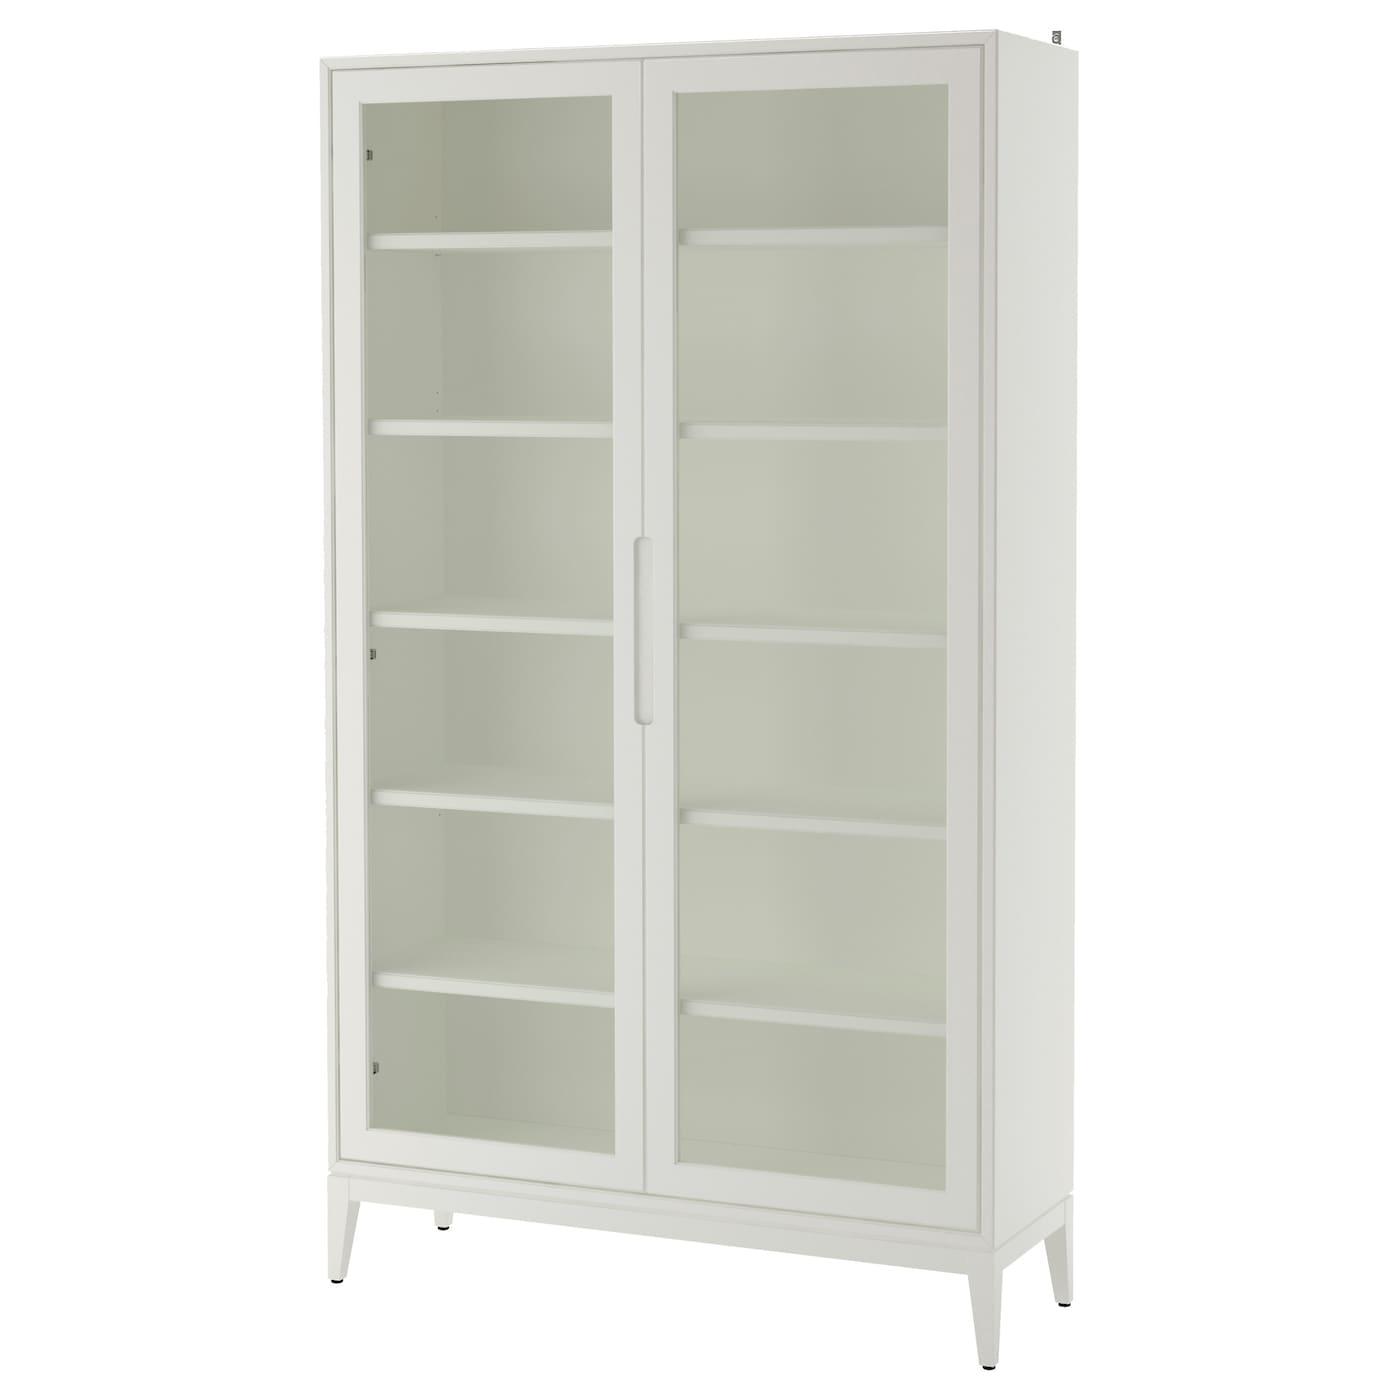 Regiss r vitrina blanco 118 x 203 cm ikea - Ikea vitrinas comedor ...